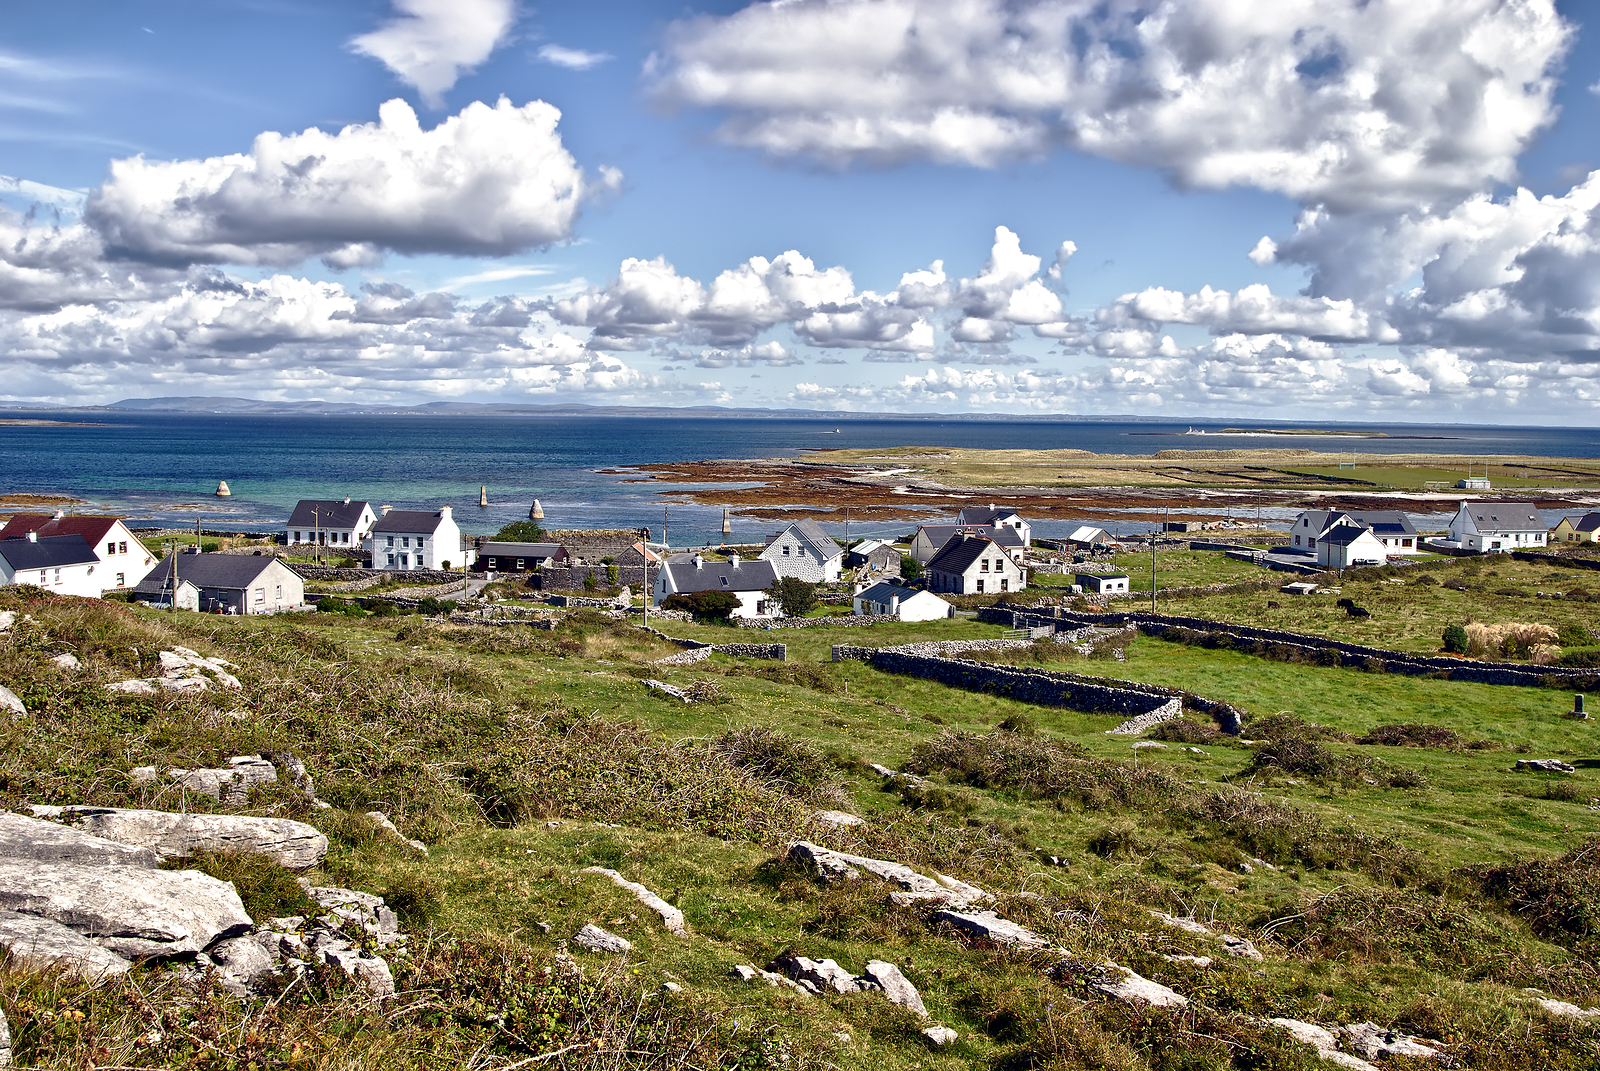 bigstock-Kileany-Inis-M-r-Island-Ire-28443992